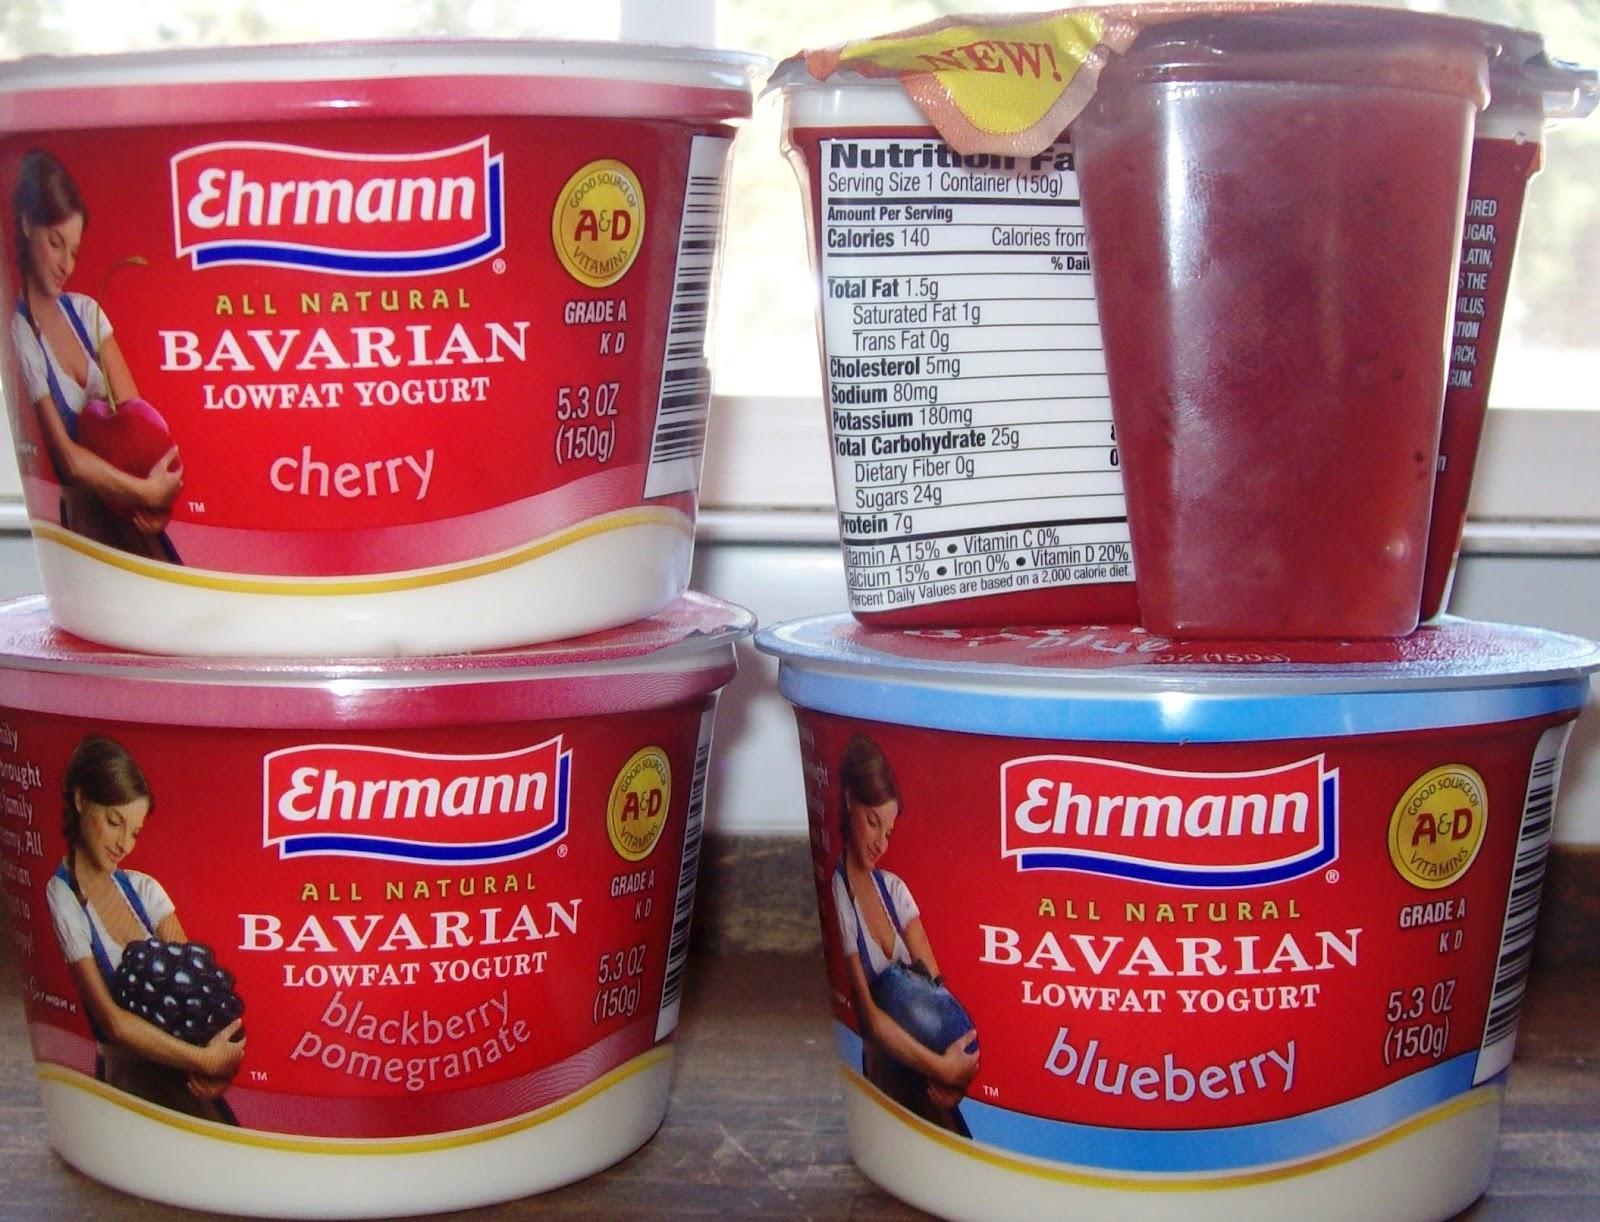 Ehrmann Bavarian Yogurt Review The Nutritionist Reviews